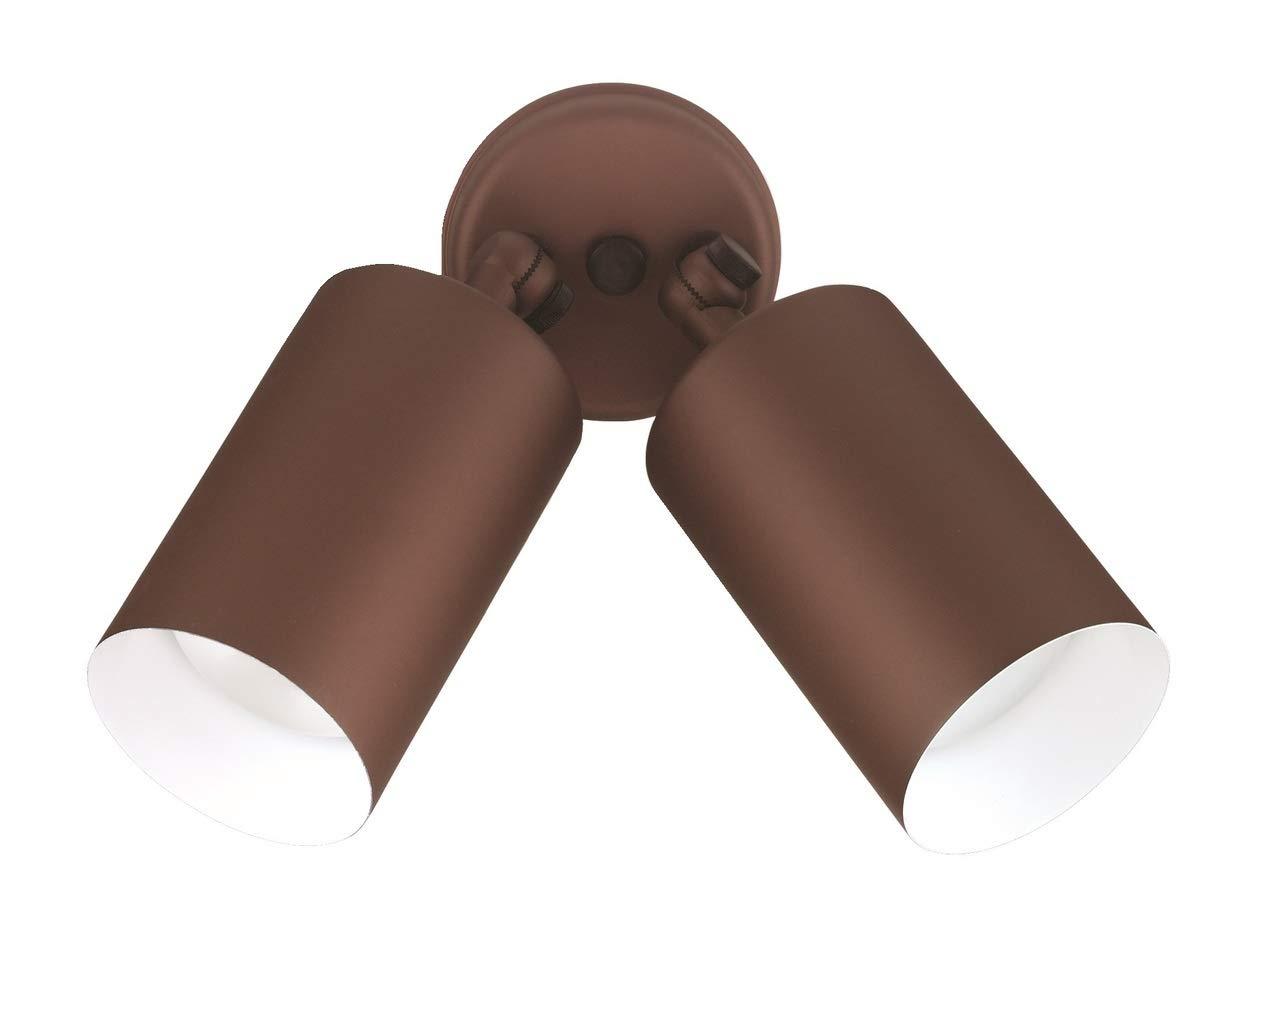 NICOR Lighting 75-Watt Double Bullet Adjustable Flood Light, Bronze (11728)